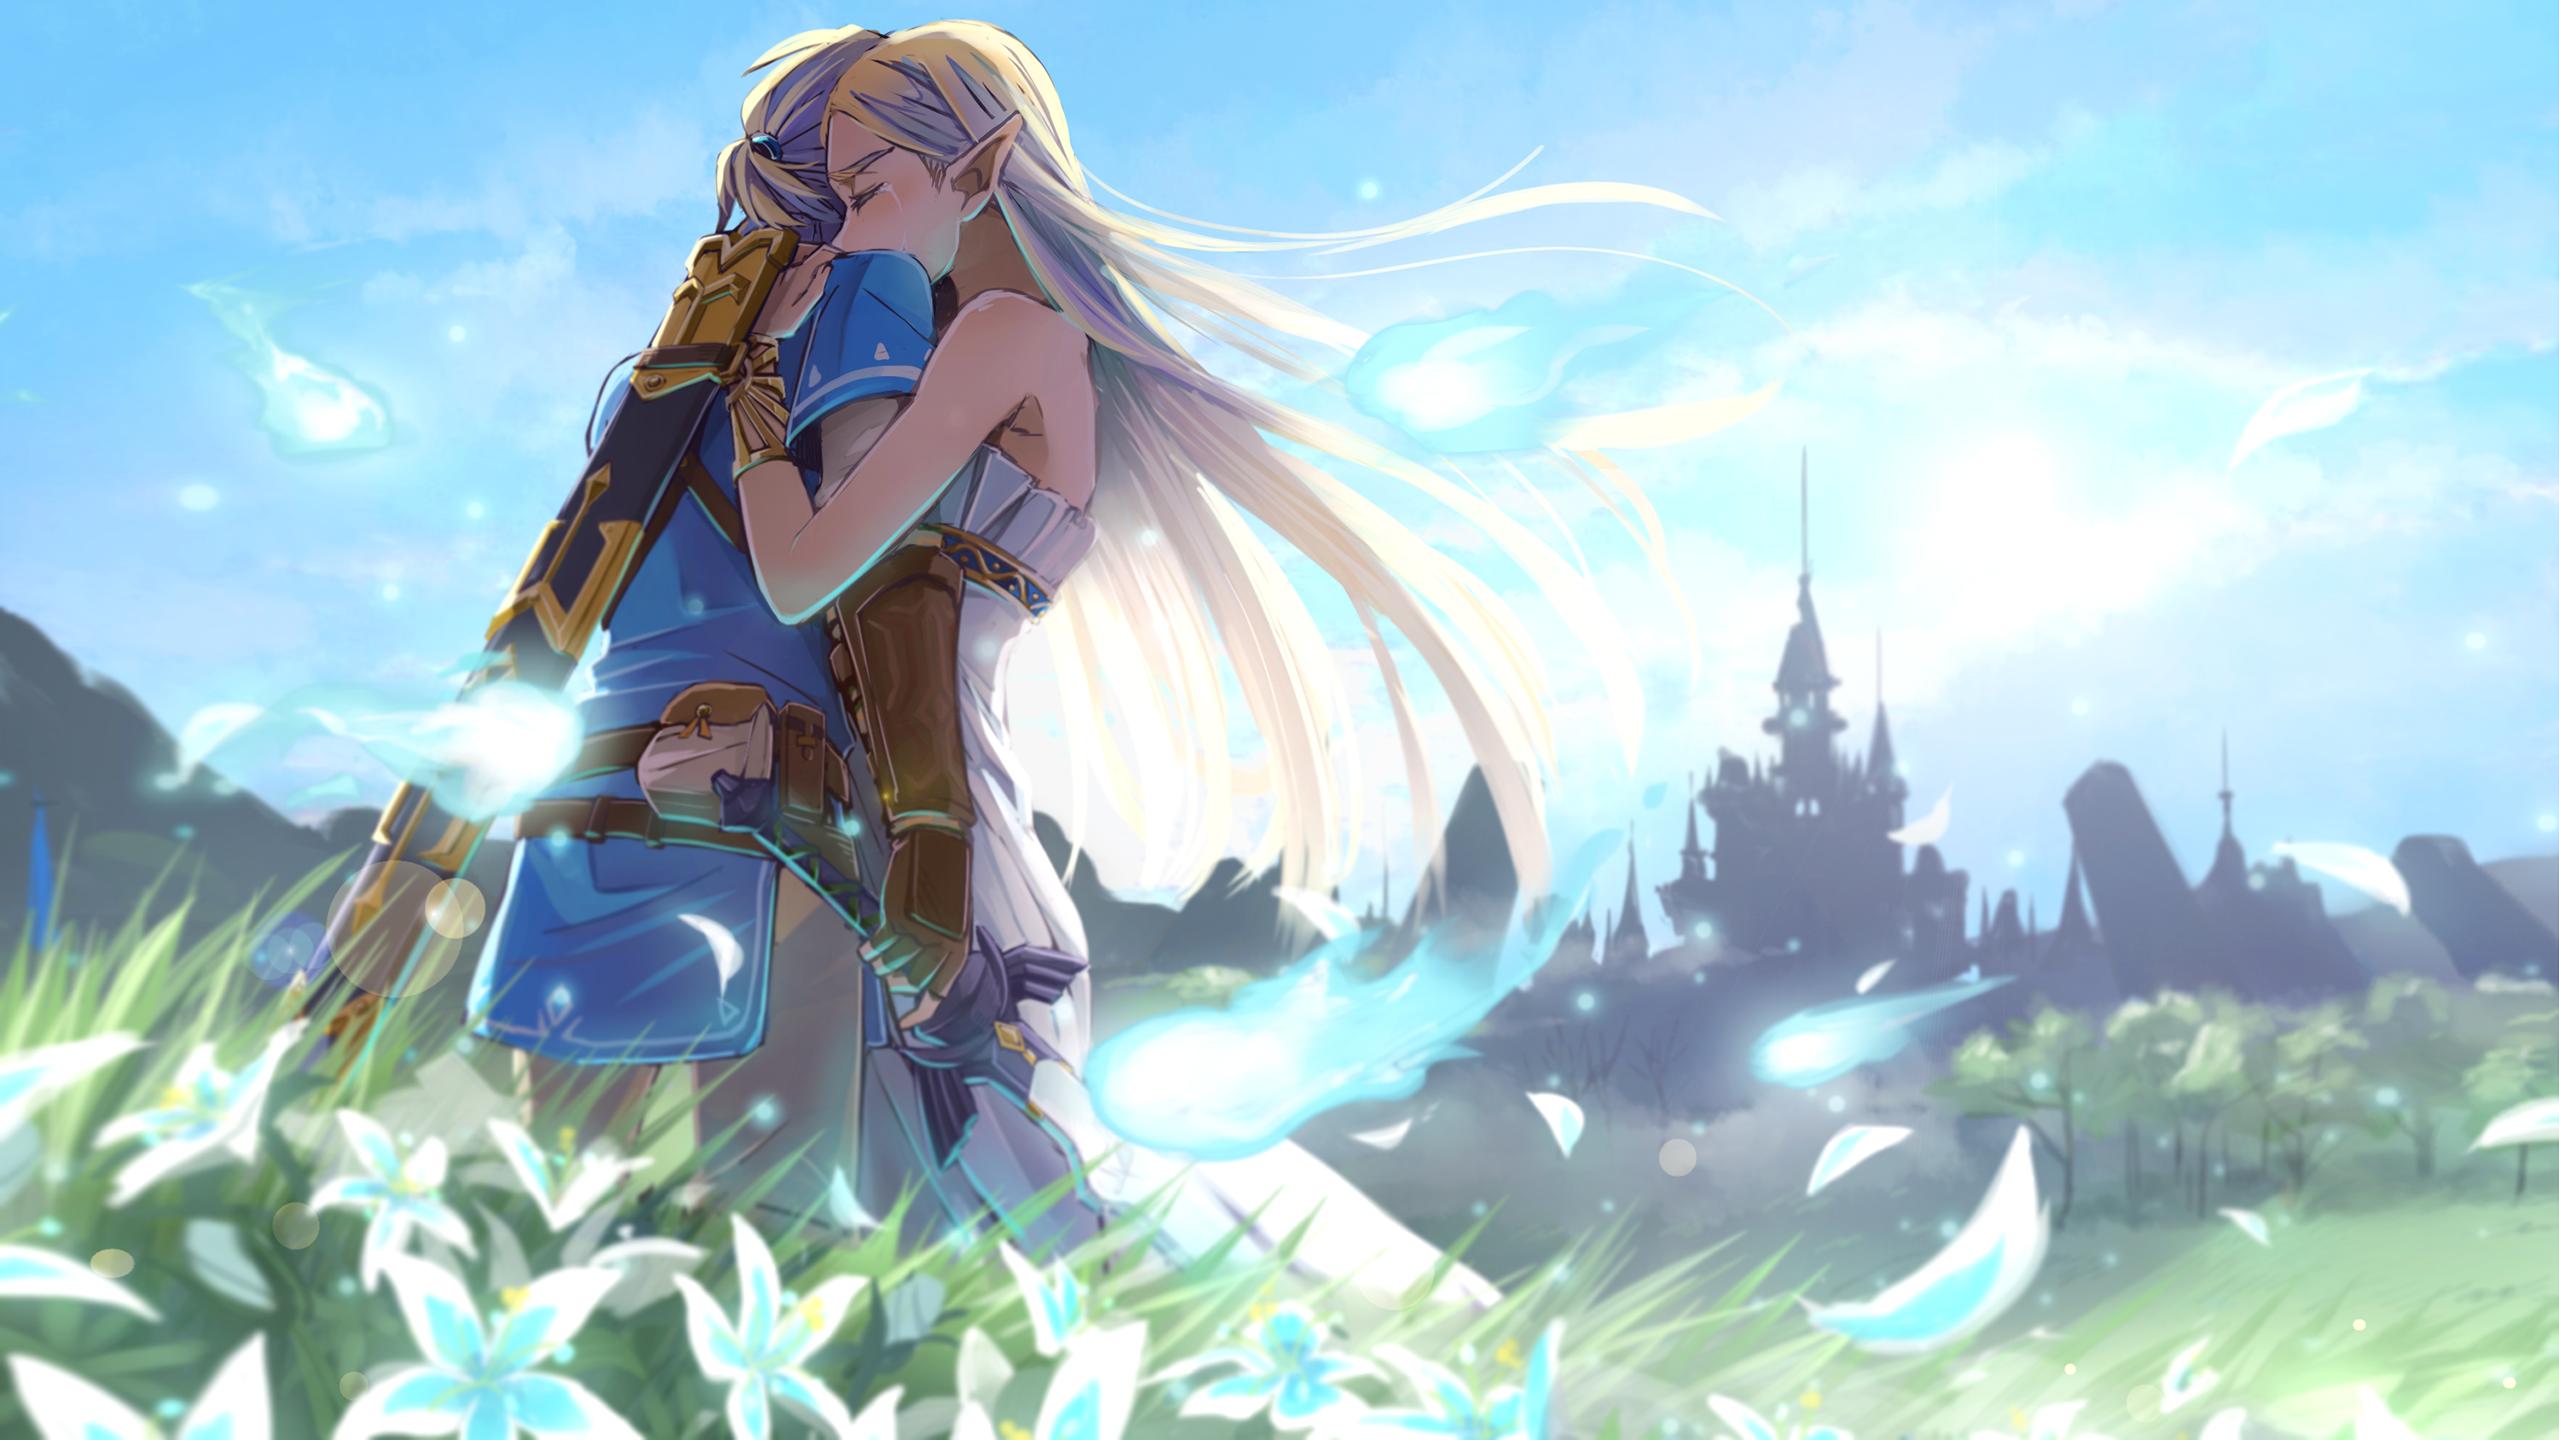 Wallpaper The Legend Of Zelda Video Games Link The Legend Of